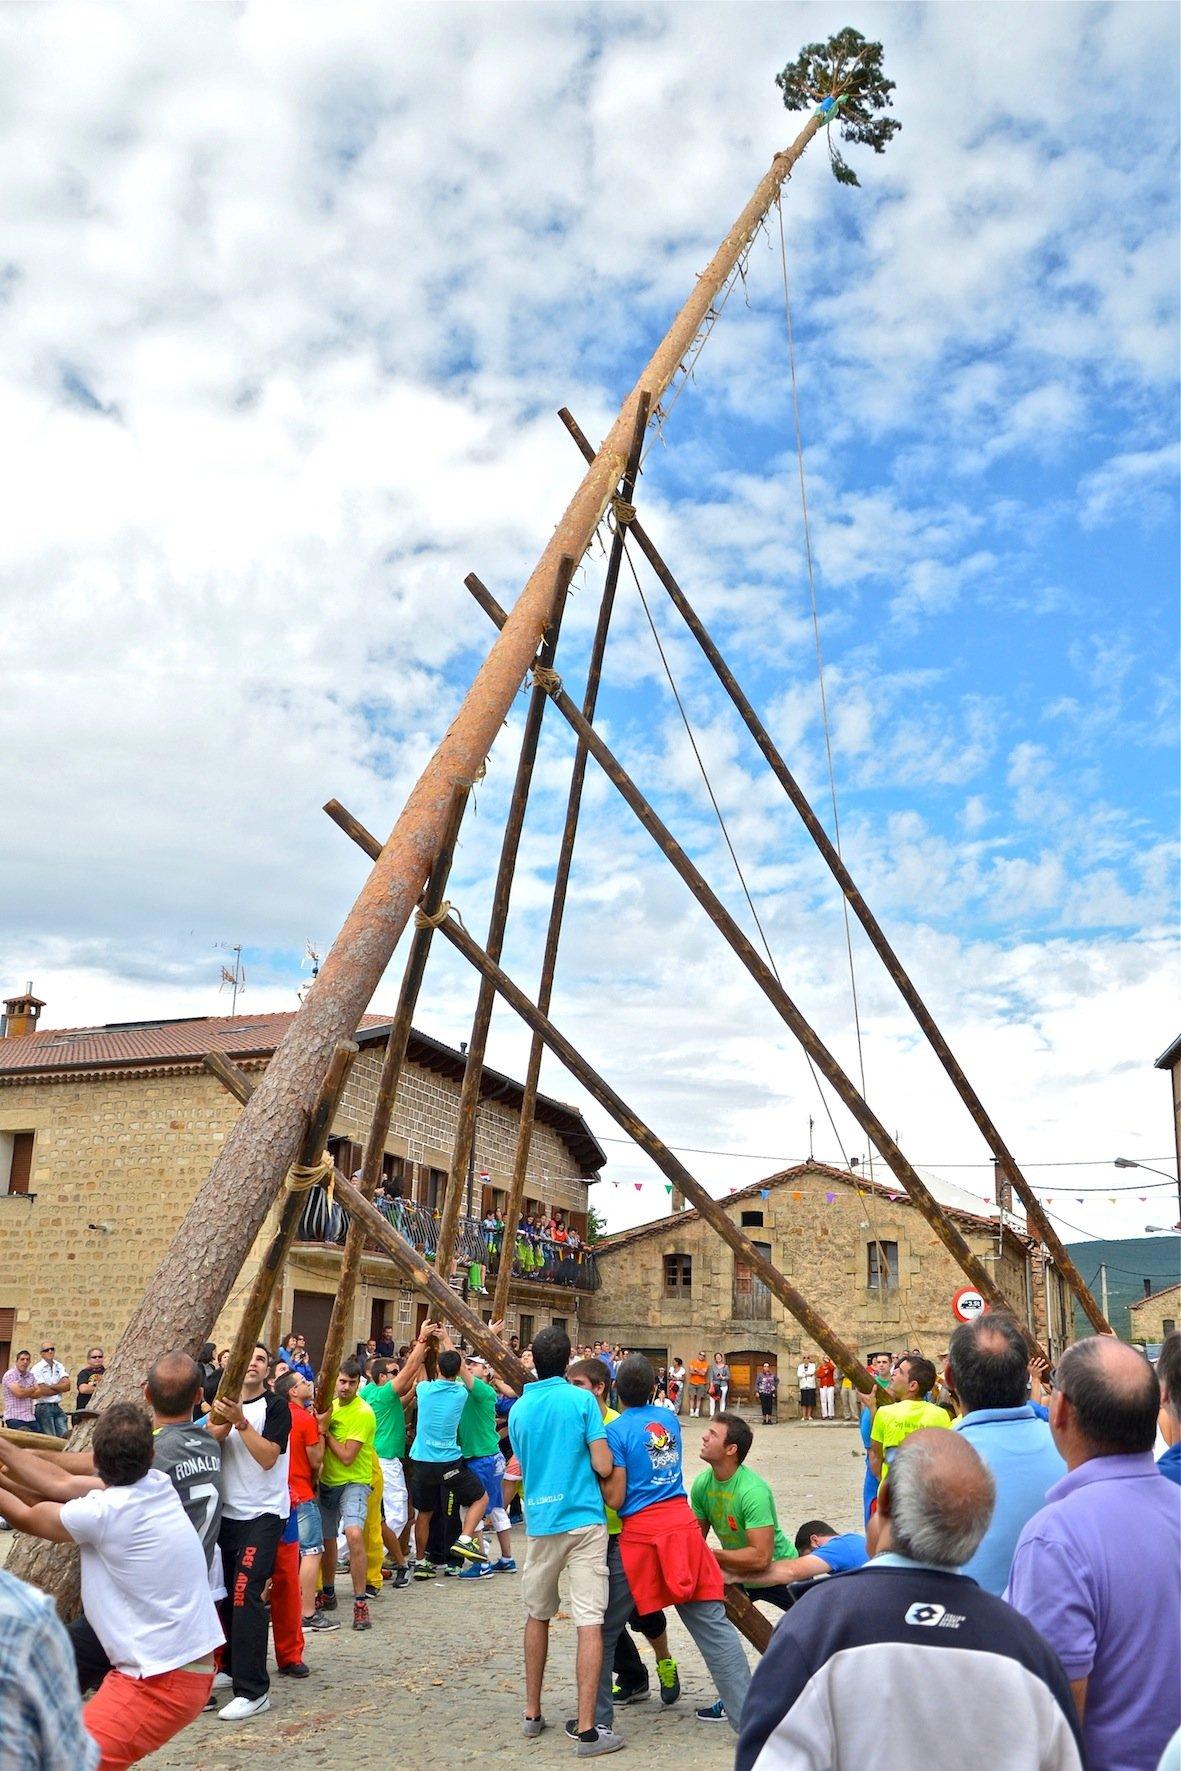 Fiestas de Duruelo de la Sierra en Soria